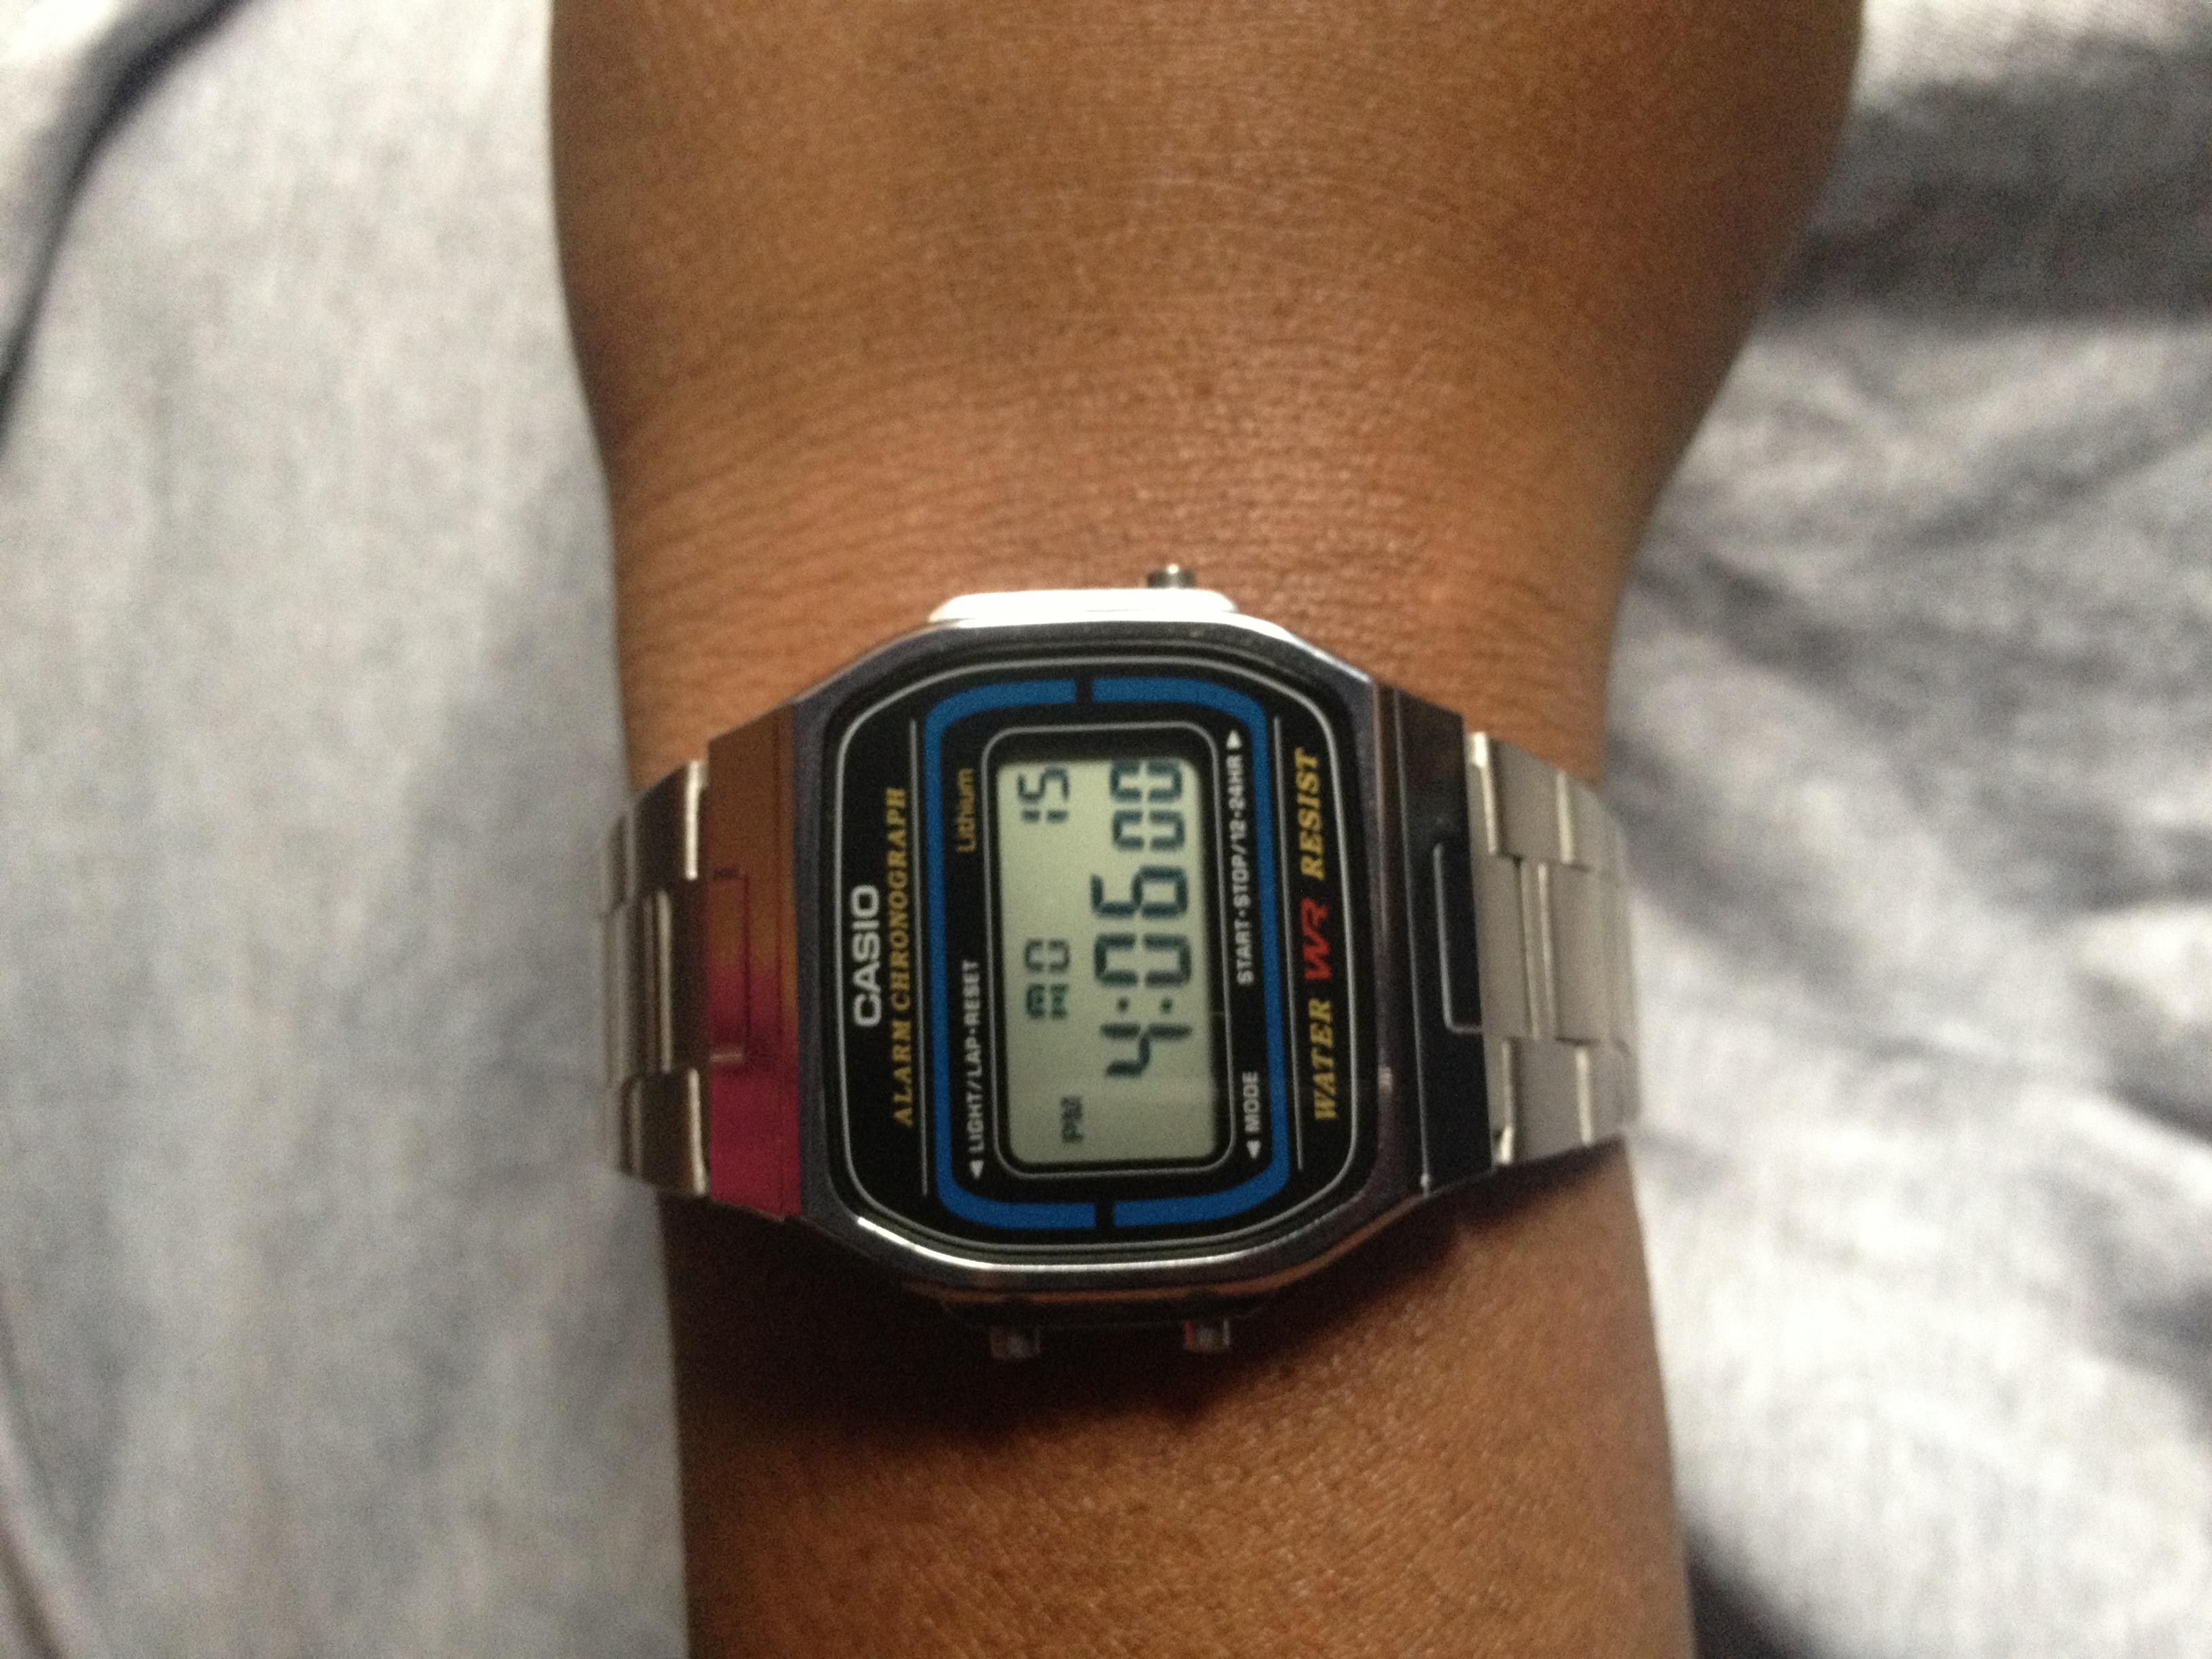 162cd121eff Unisex Casio Classic Alarm Chronograph Watch (A164WA-1VES ...